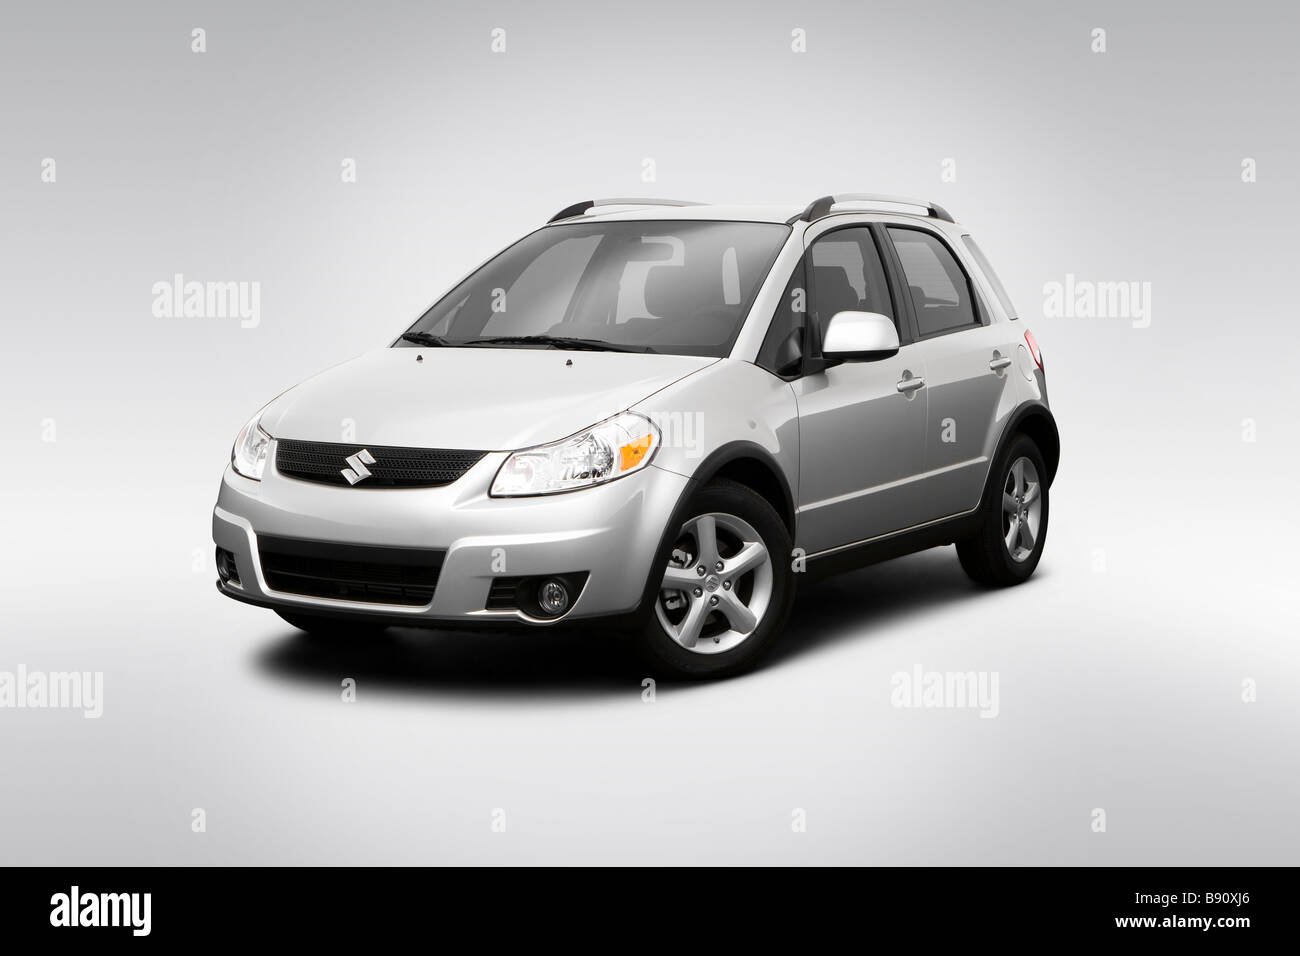 2009 Suzuki SX4 Crossover in Silver - Front angle view - Stock Image